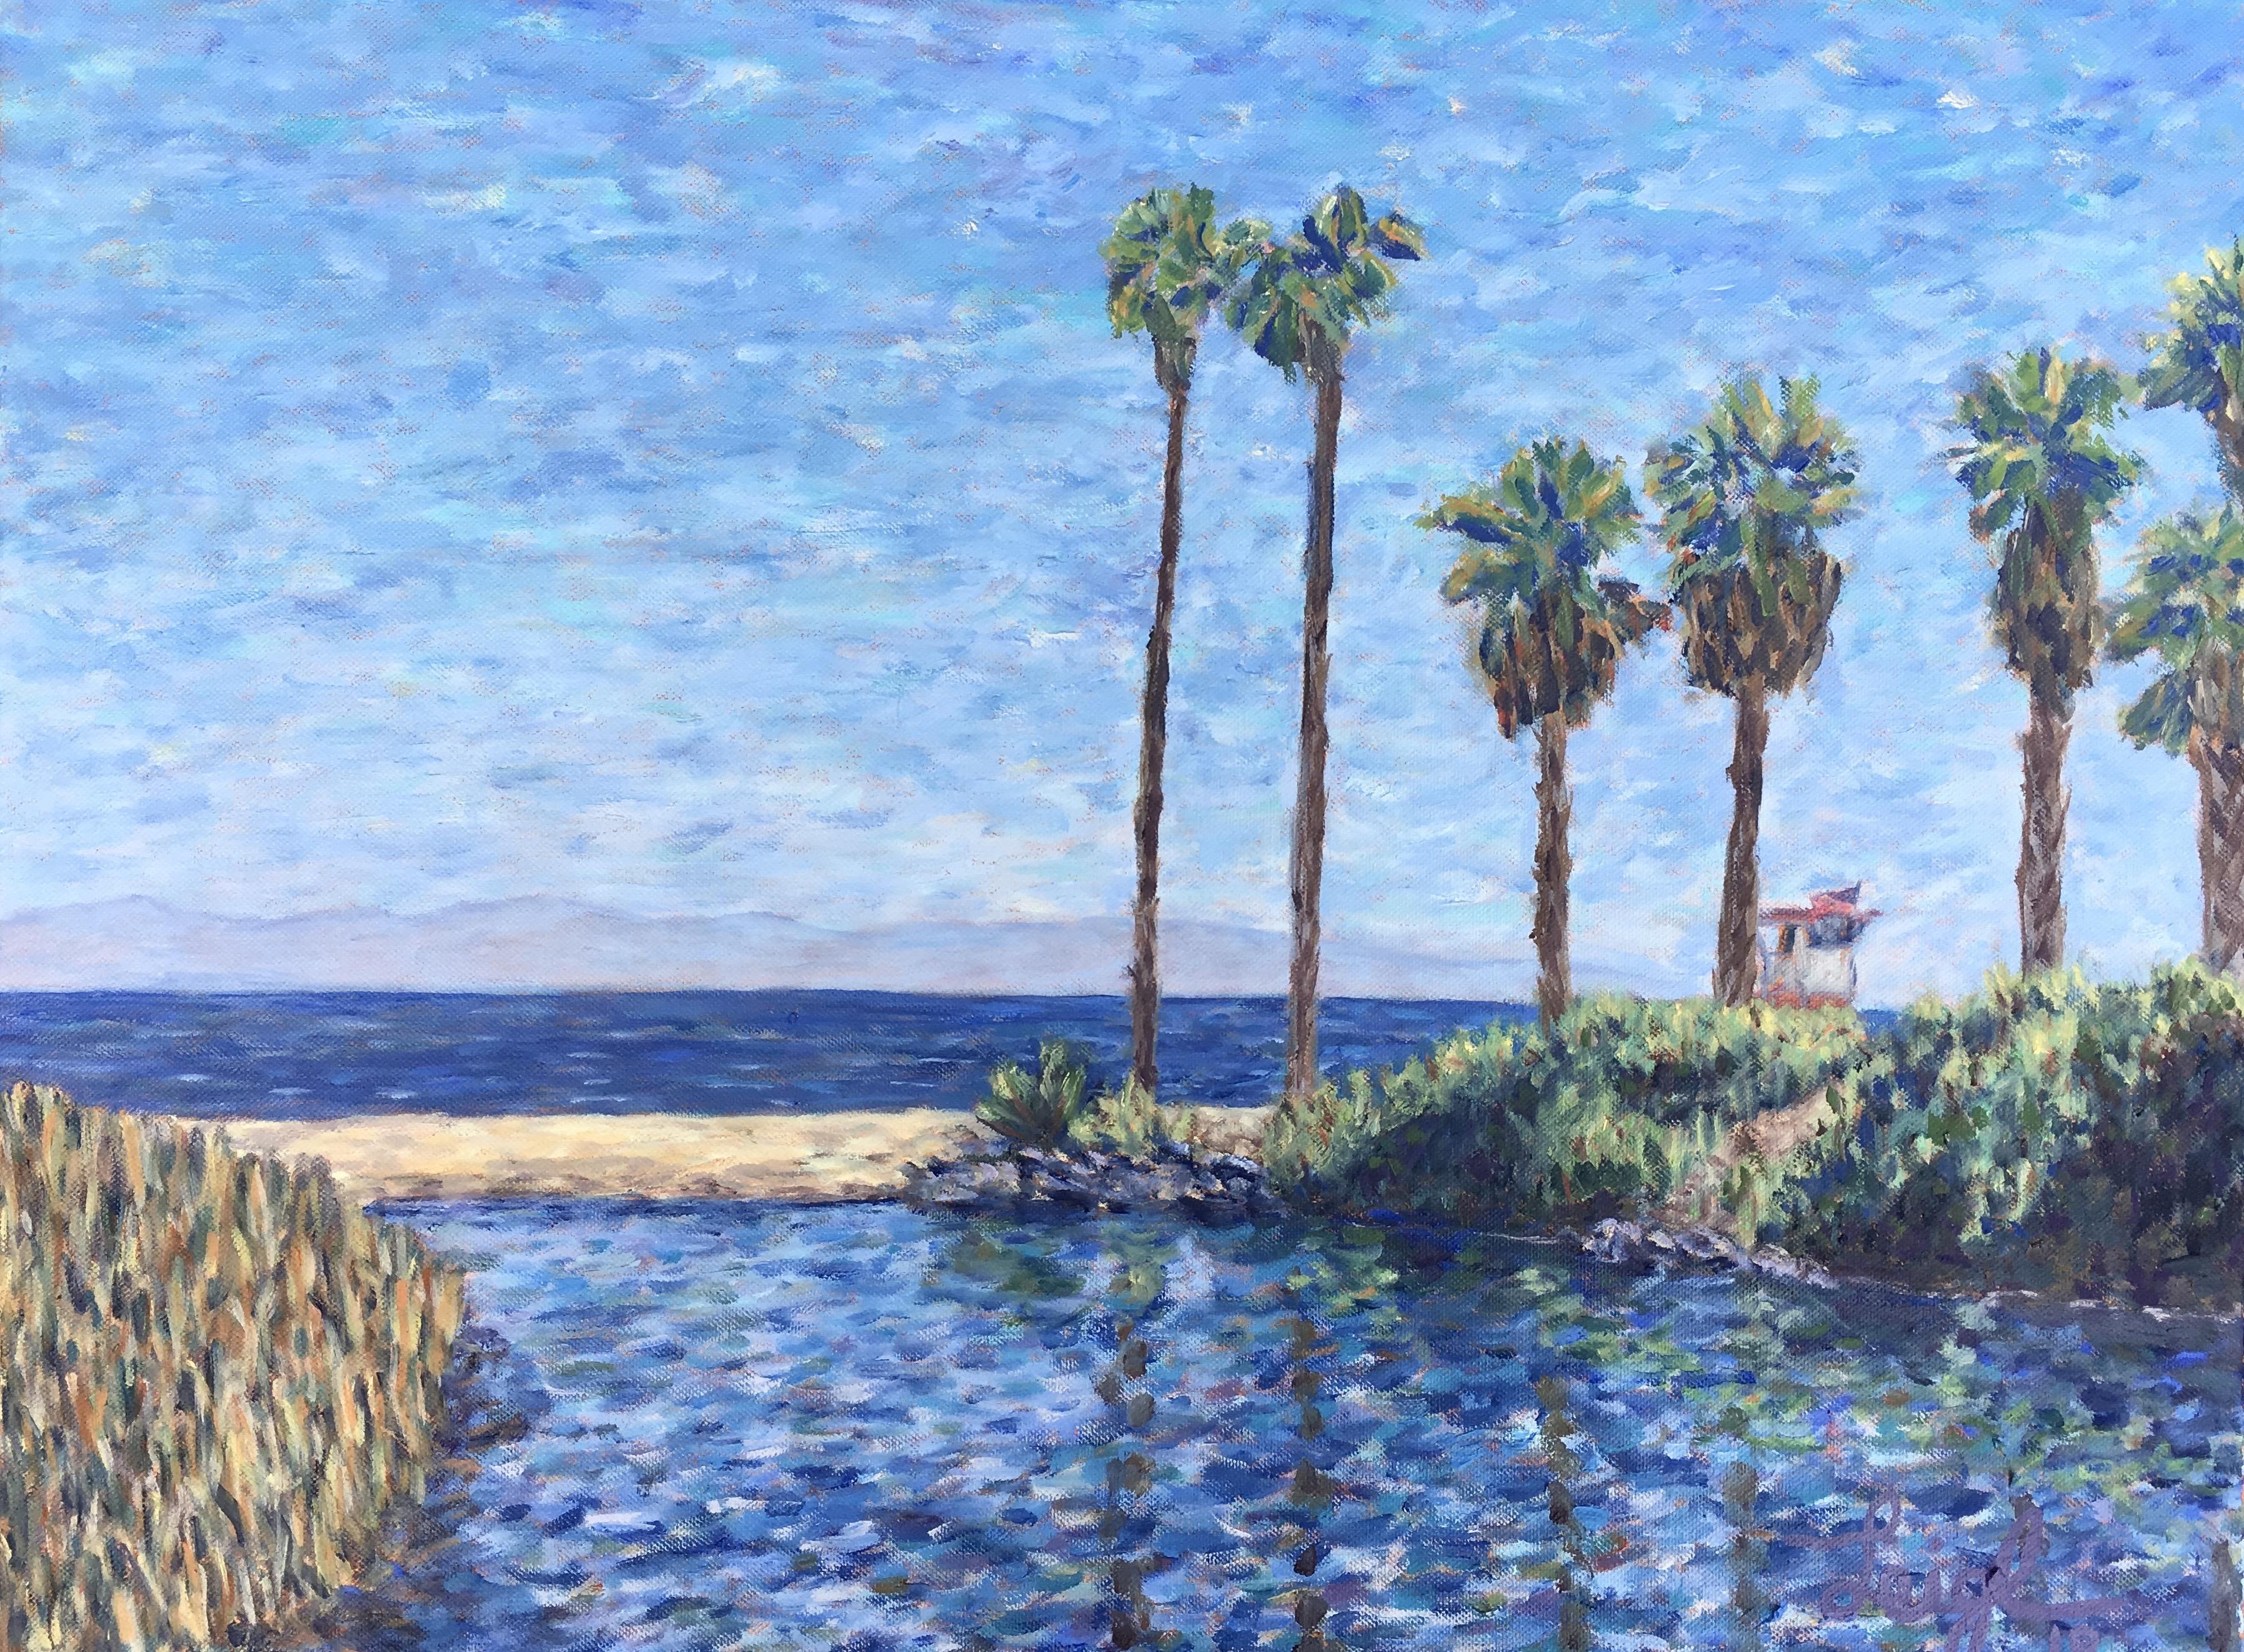 Hendry's Beach, Santa Barbara  ~   Larissa Rice, Temecula, CA 2019  •  24 x 18